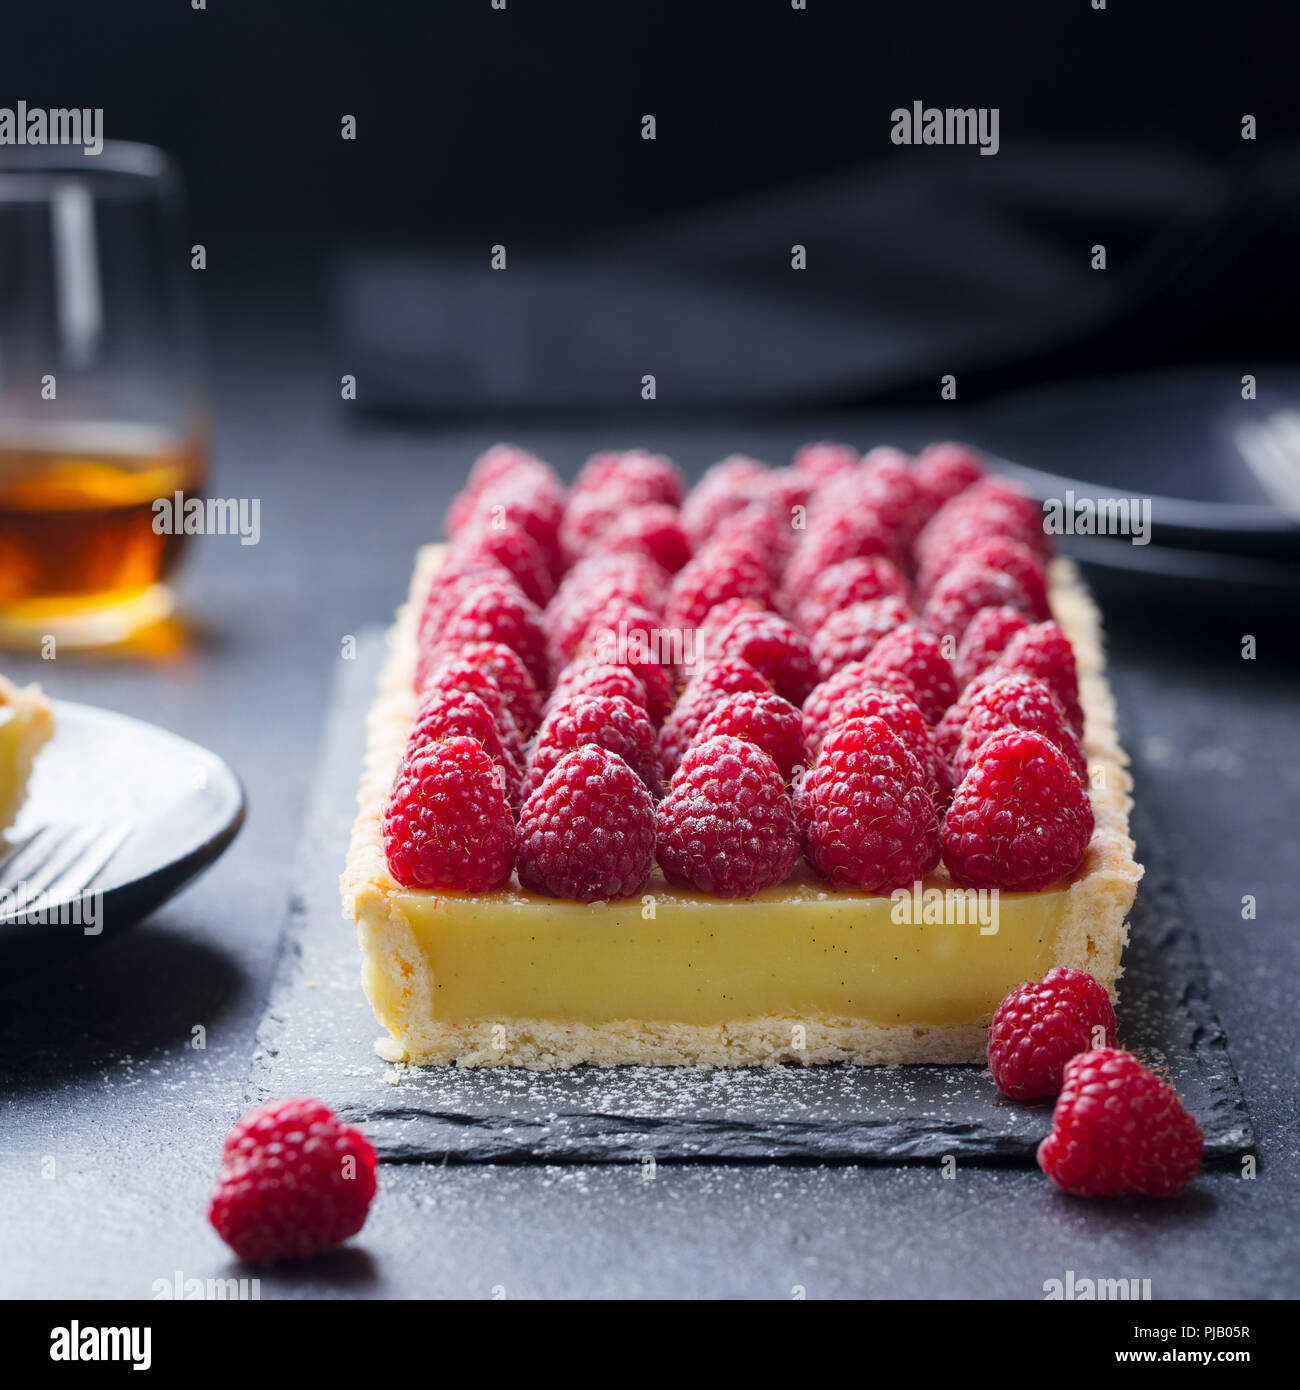 Raspberry tart with vanilla custard and white chocolate on slate board. Black stone background. Copy space. - Stock Image